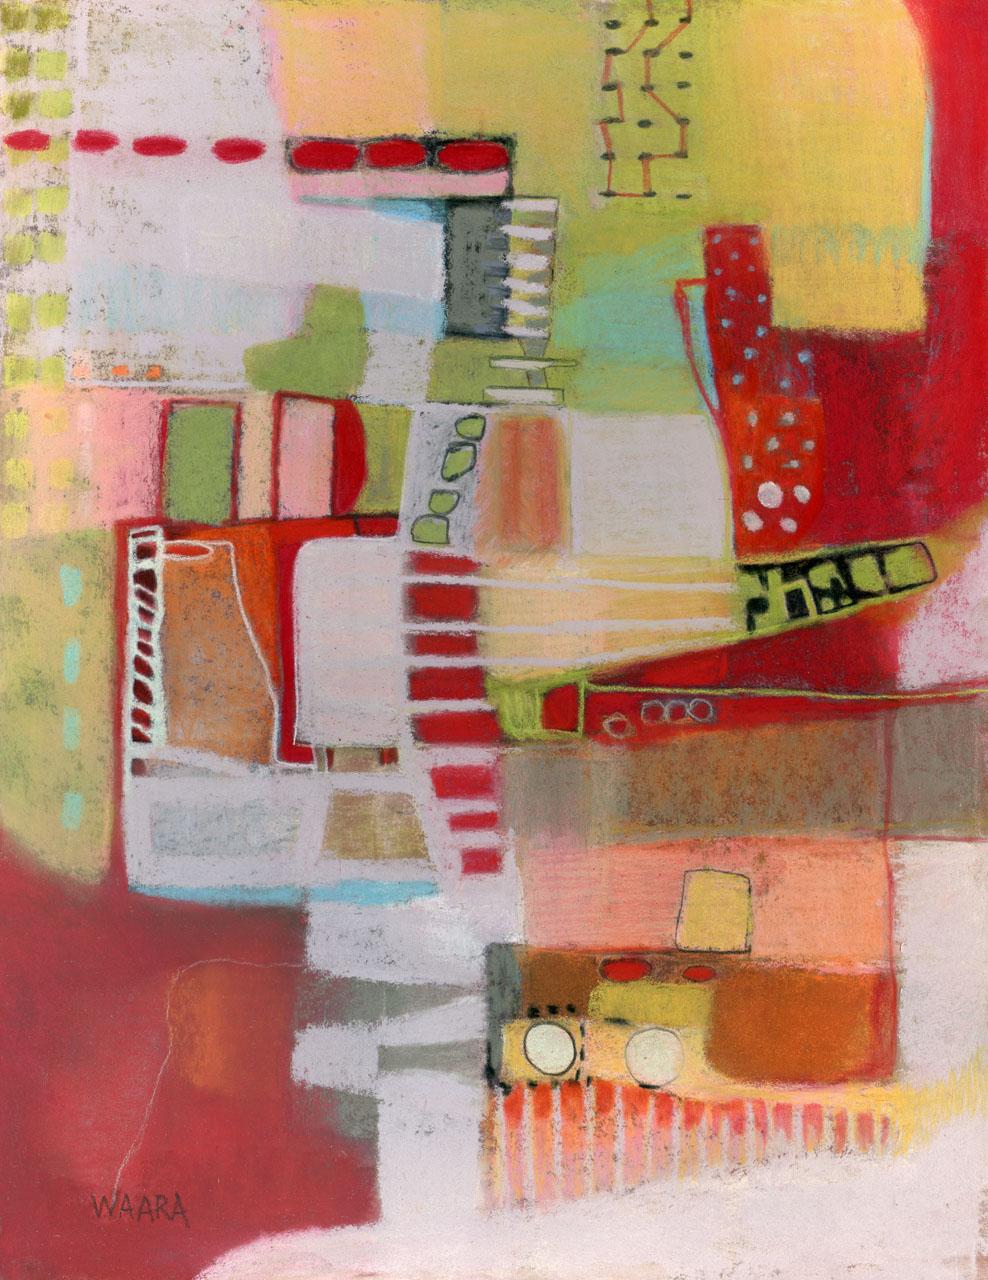 Original pastel abstract painting by Maui artist Christine Waara